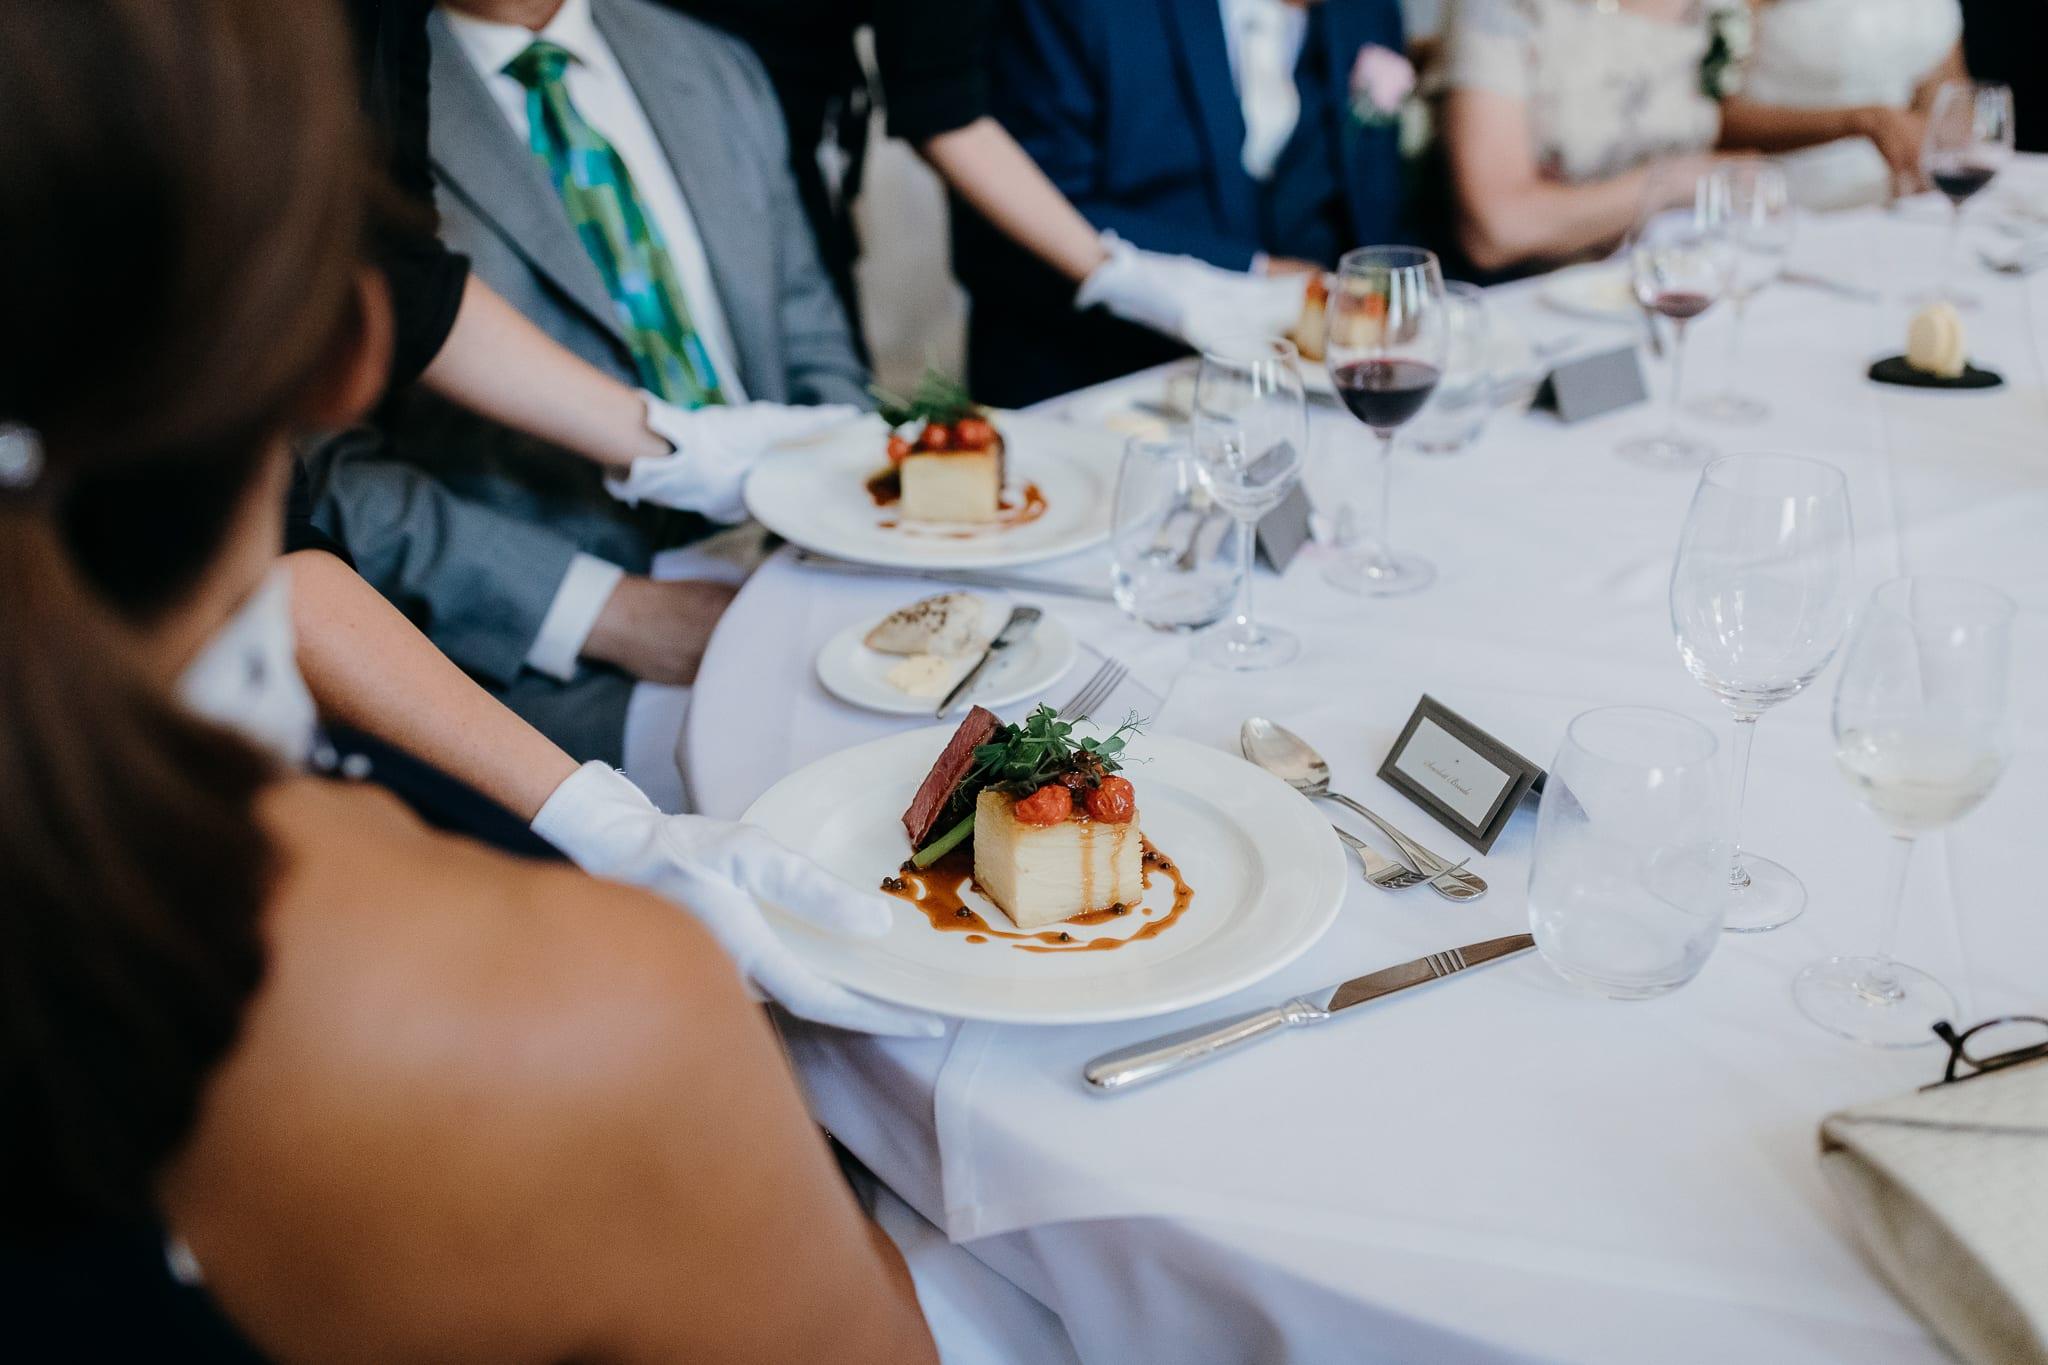 Wedding main course food ideas